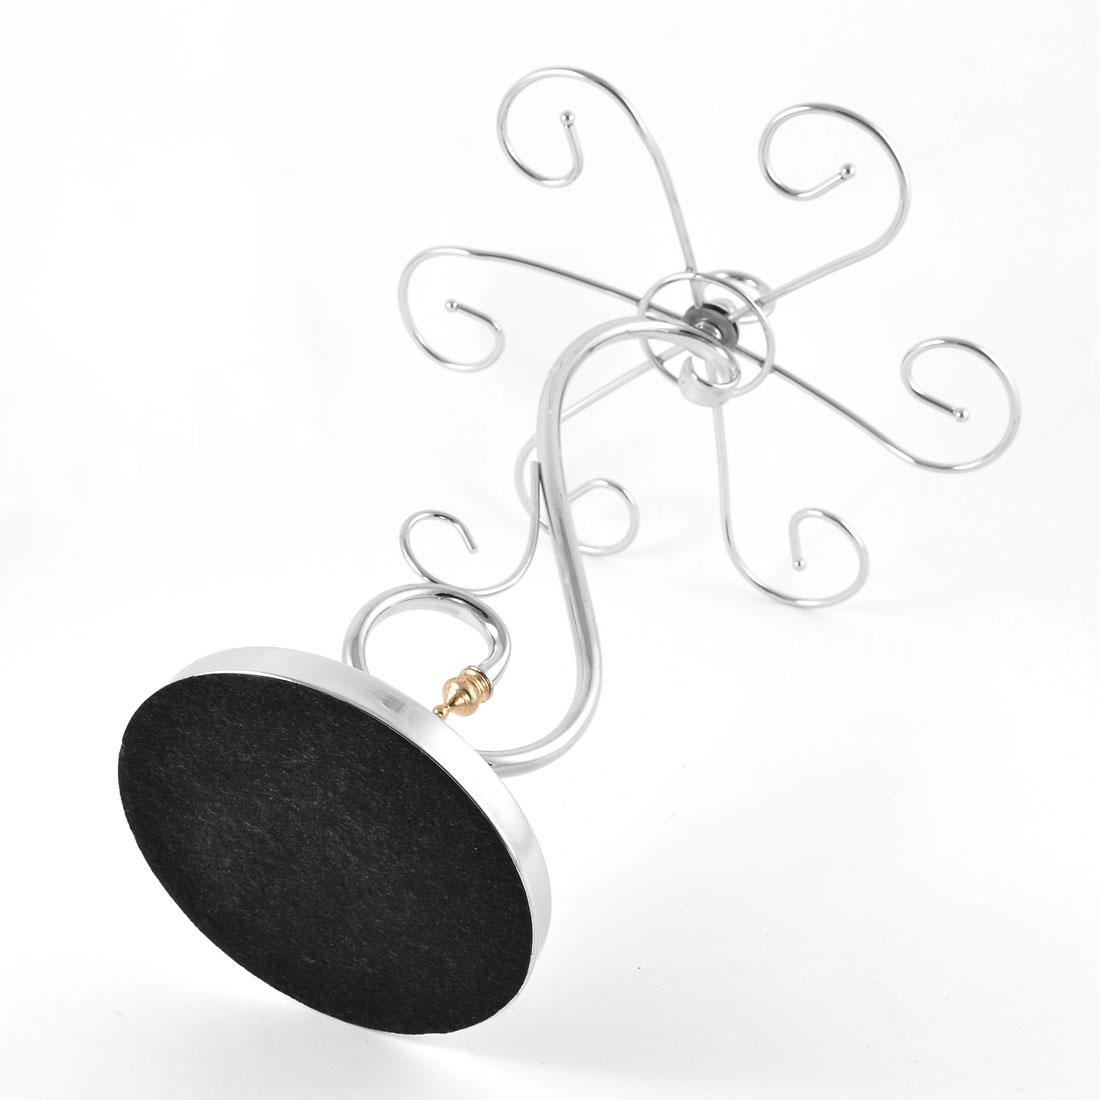 Metal Elegant Tabletop 6 Wine Glass Drying Rack Ring Display Stand Silver Tone 3